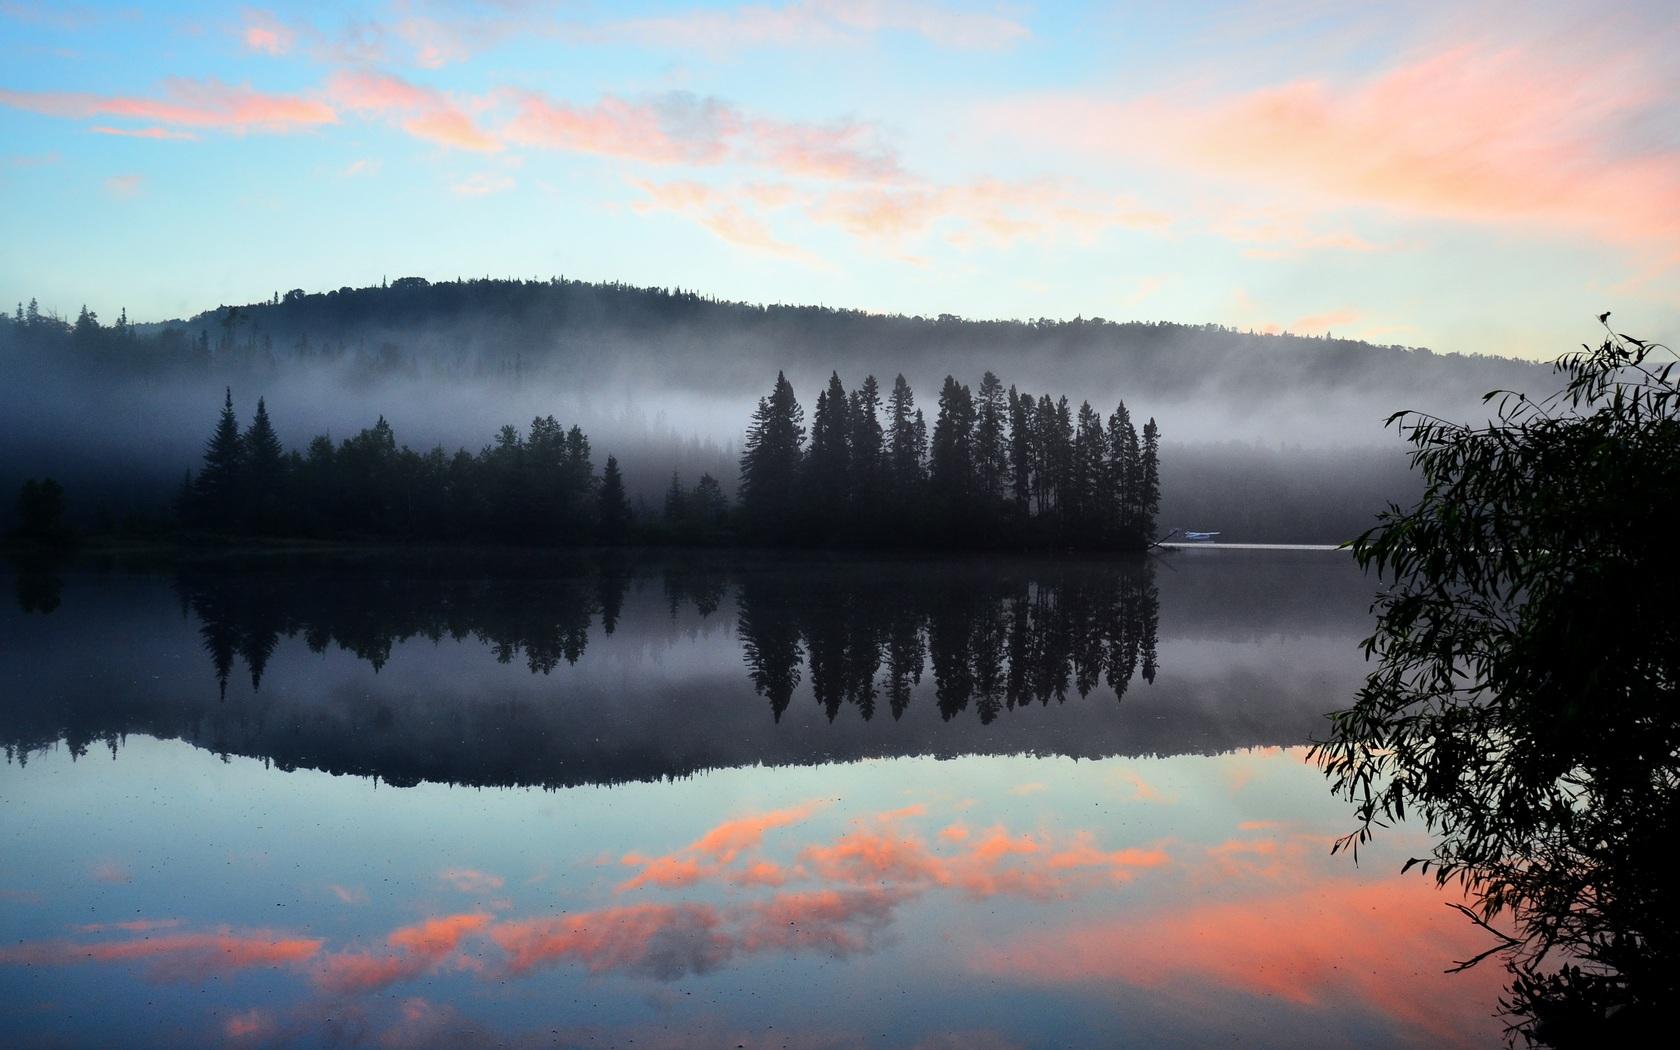 lake-reflection-mountains-26.jpg